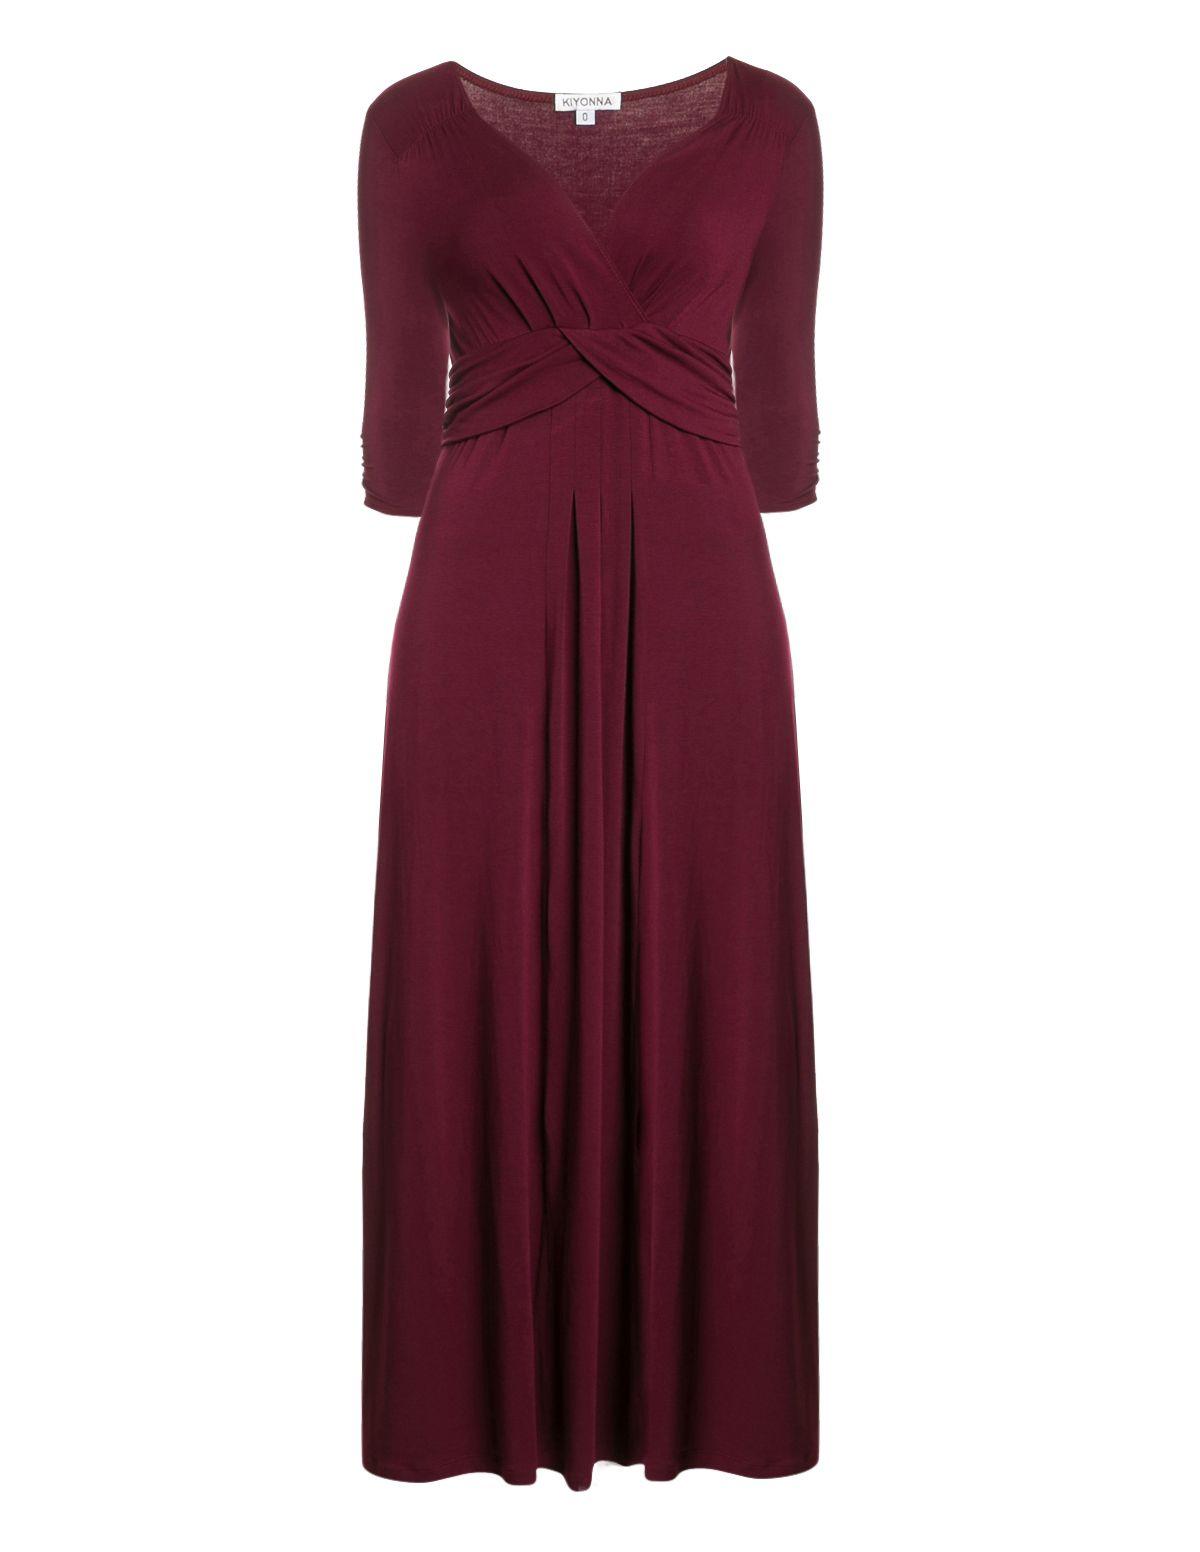 6690a00118e Shop for plus size dresses at navabi - home of designer plus size fashion.